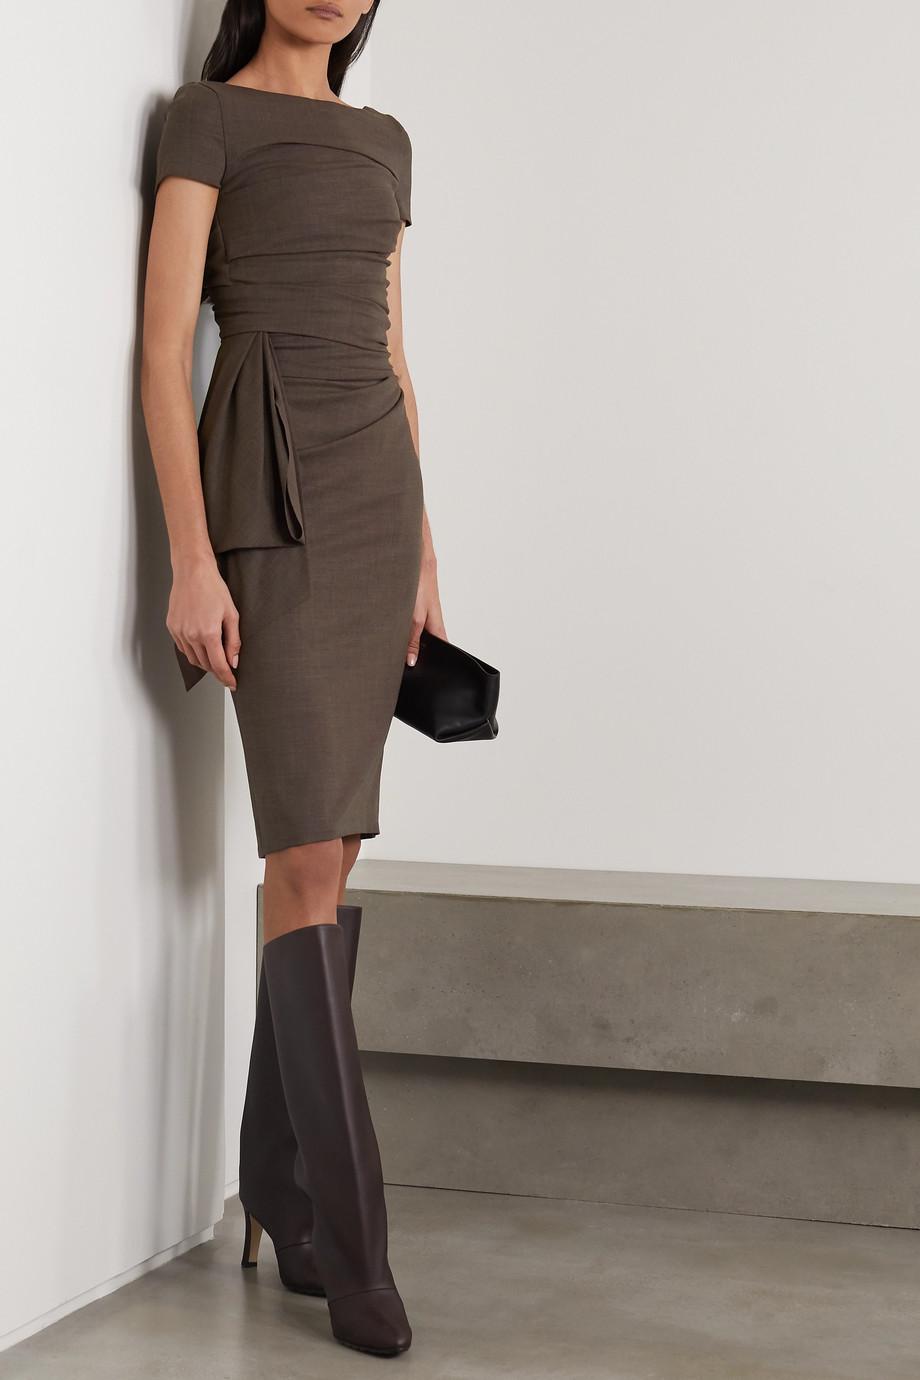 Talbot Runhof Bouvier draped gathered wool-blend voile dress